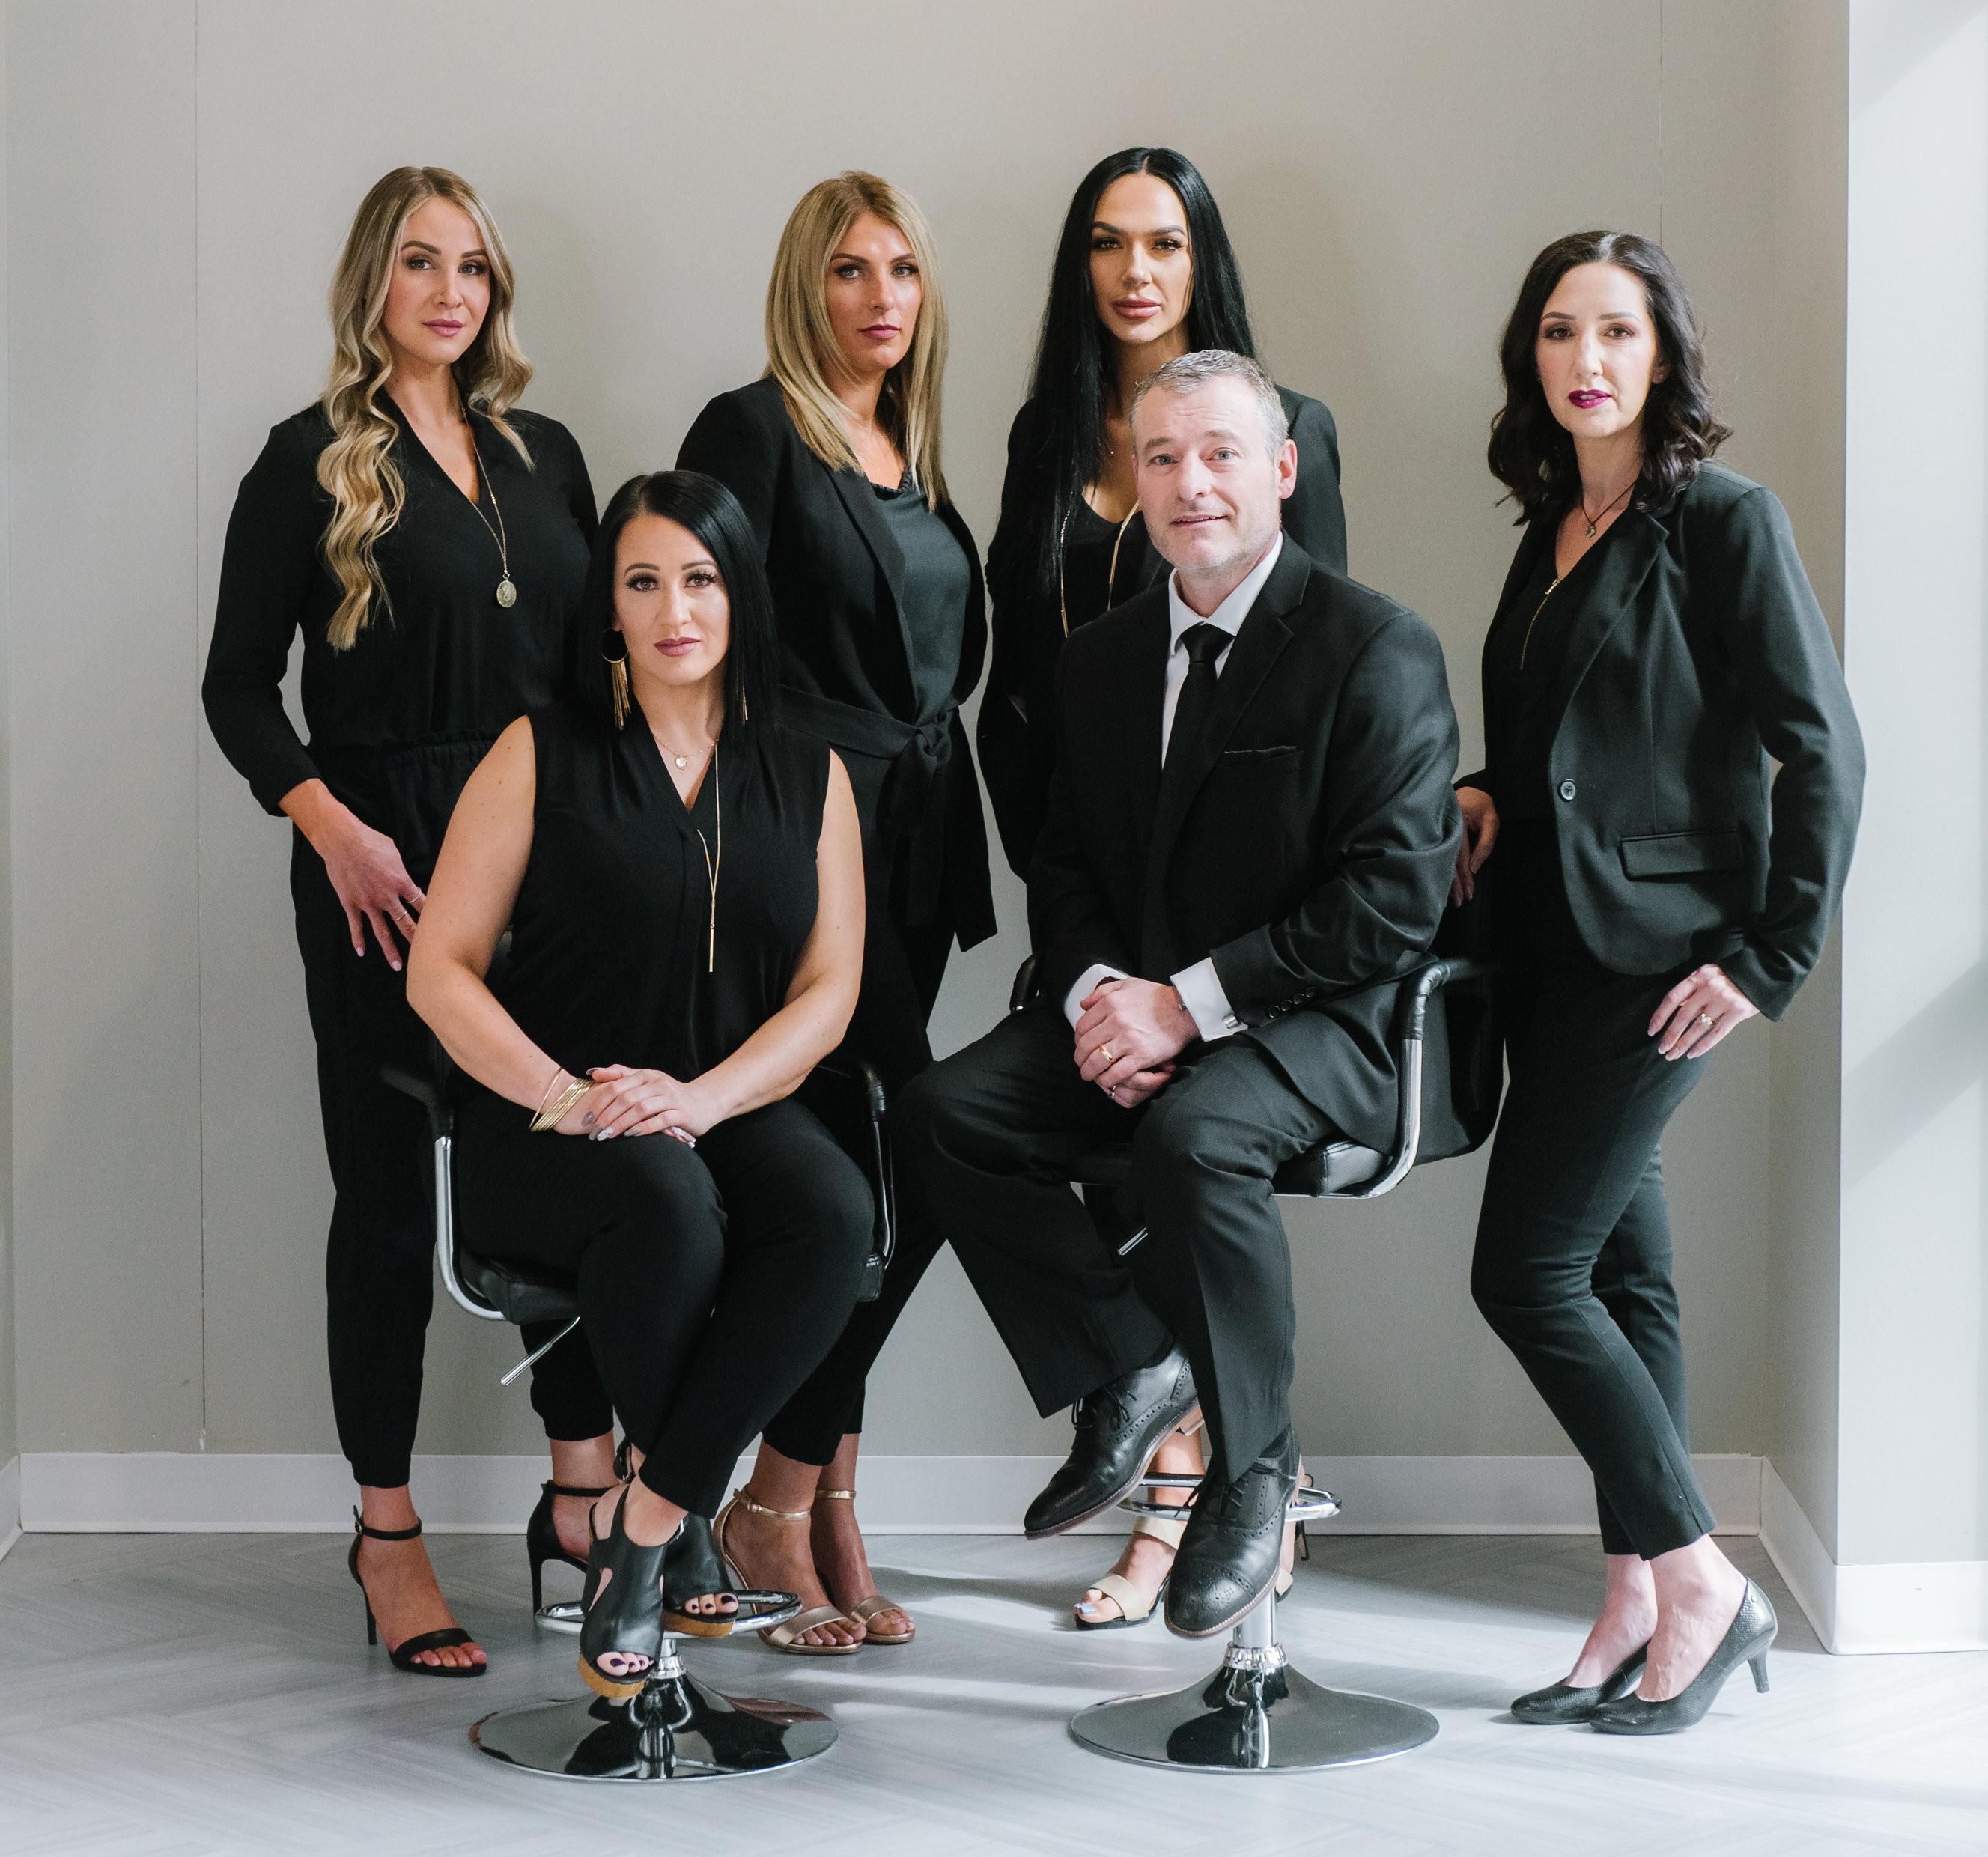 NuVista's Team